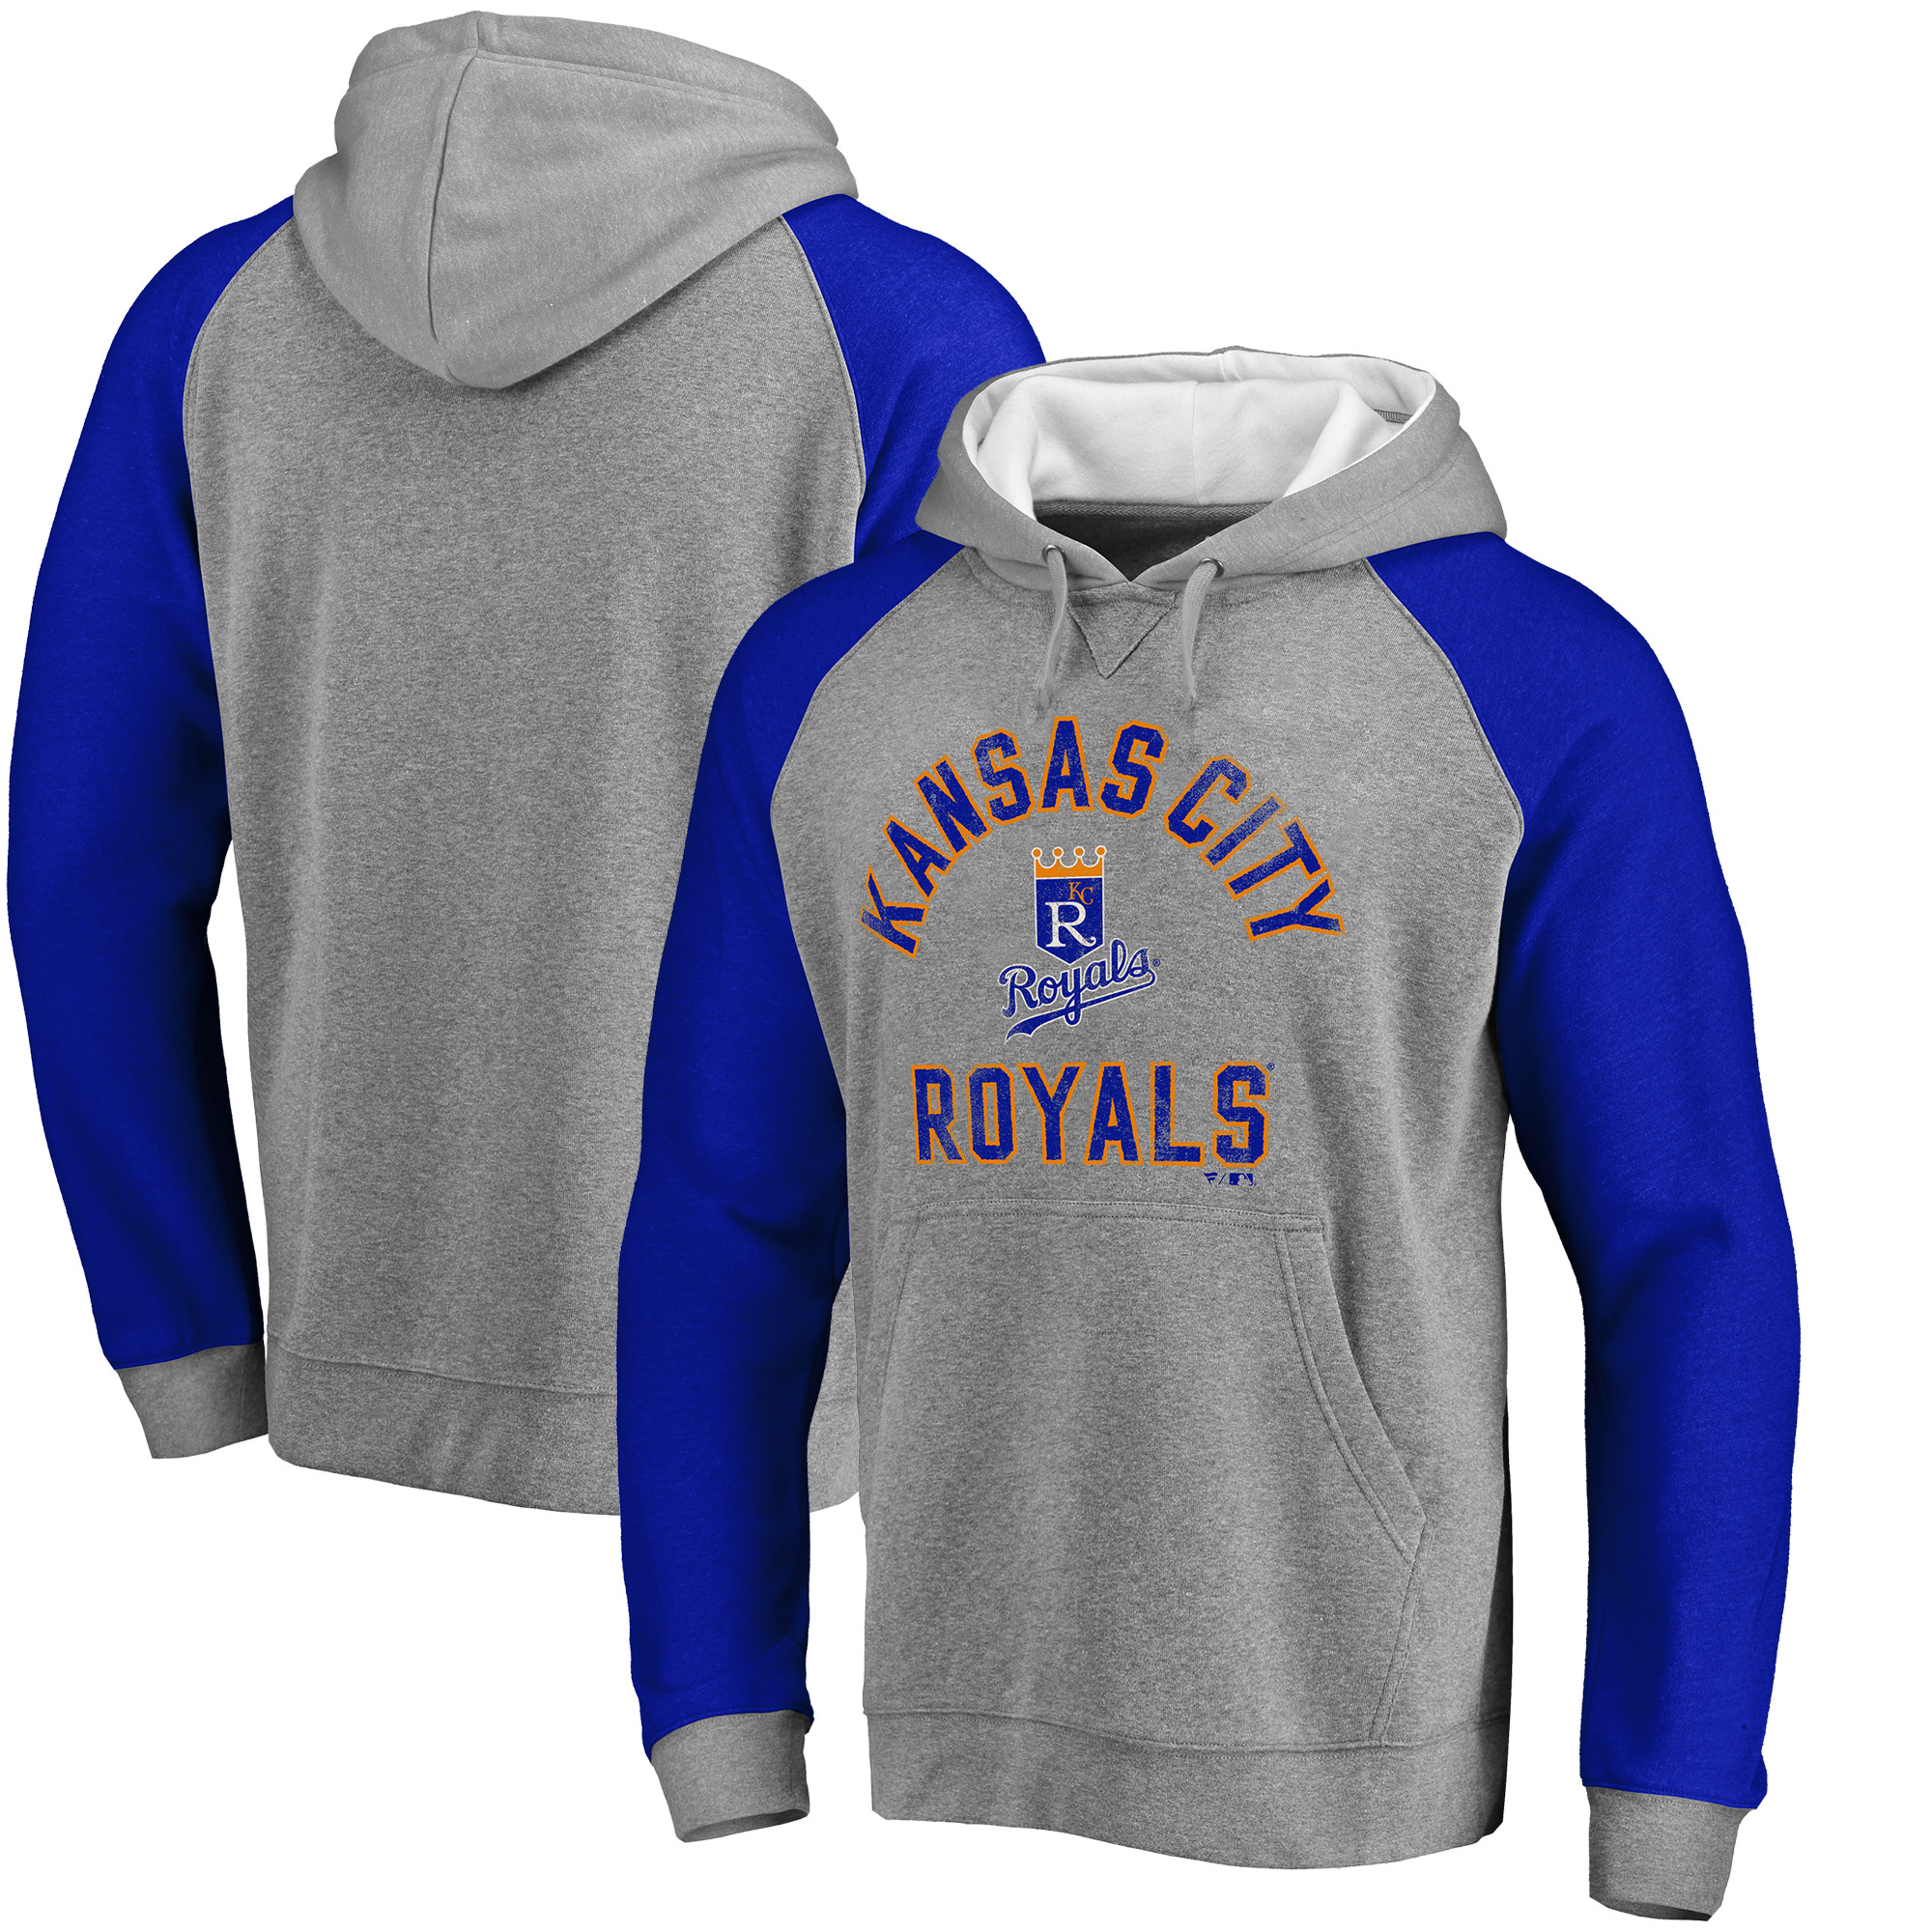 Kansas City Royals Comfort Colorblock Vintage Raglan Hoodie - Gray